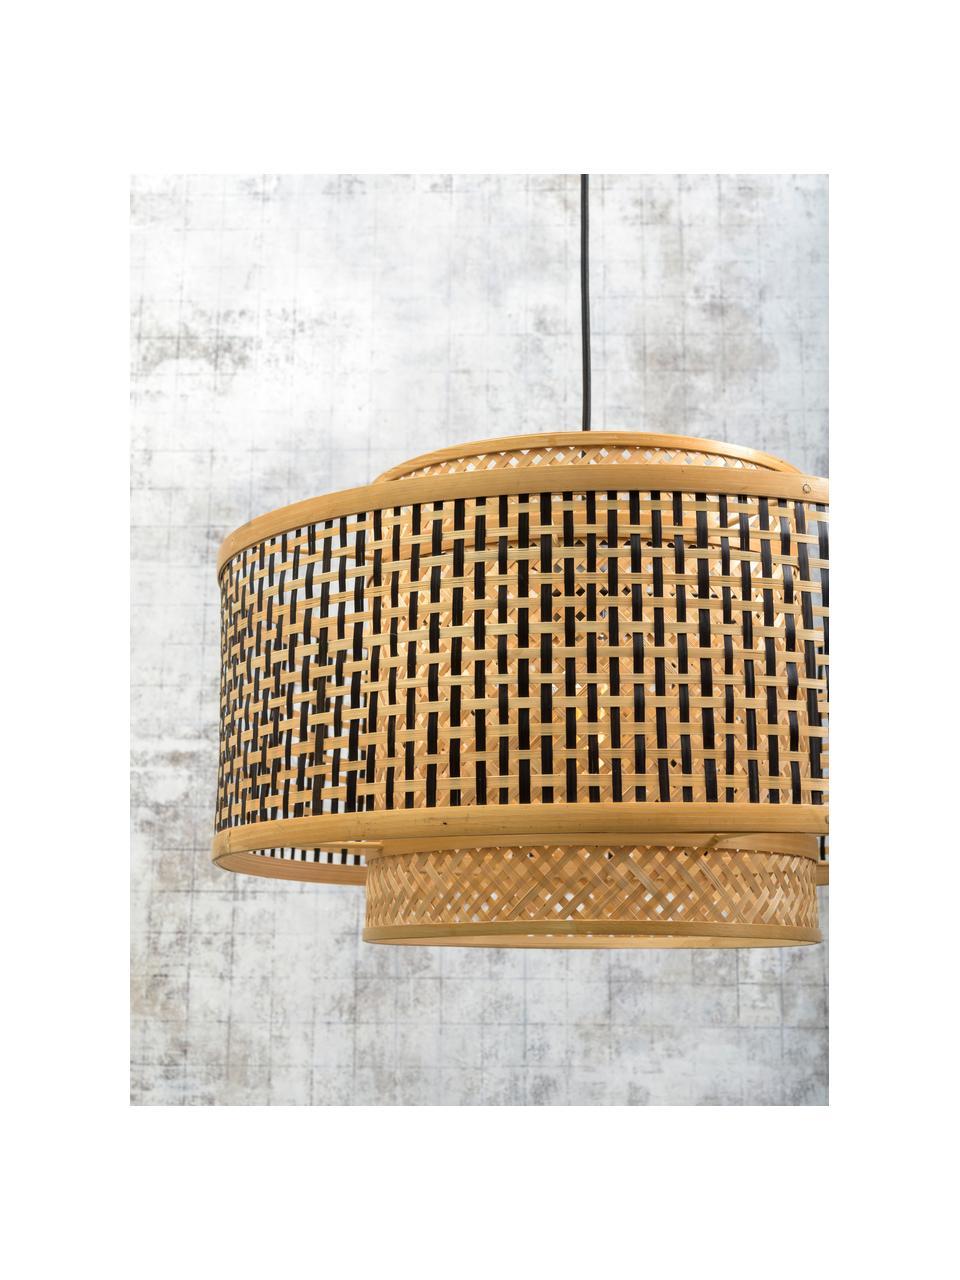 Pendelleuchte Bhutan aus Bambus, Lampenschirm: Bambus, Baldachin: Metall, beschichtet, Beige, Schwarz, Ø 50 x H 30 cm